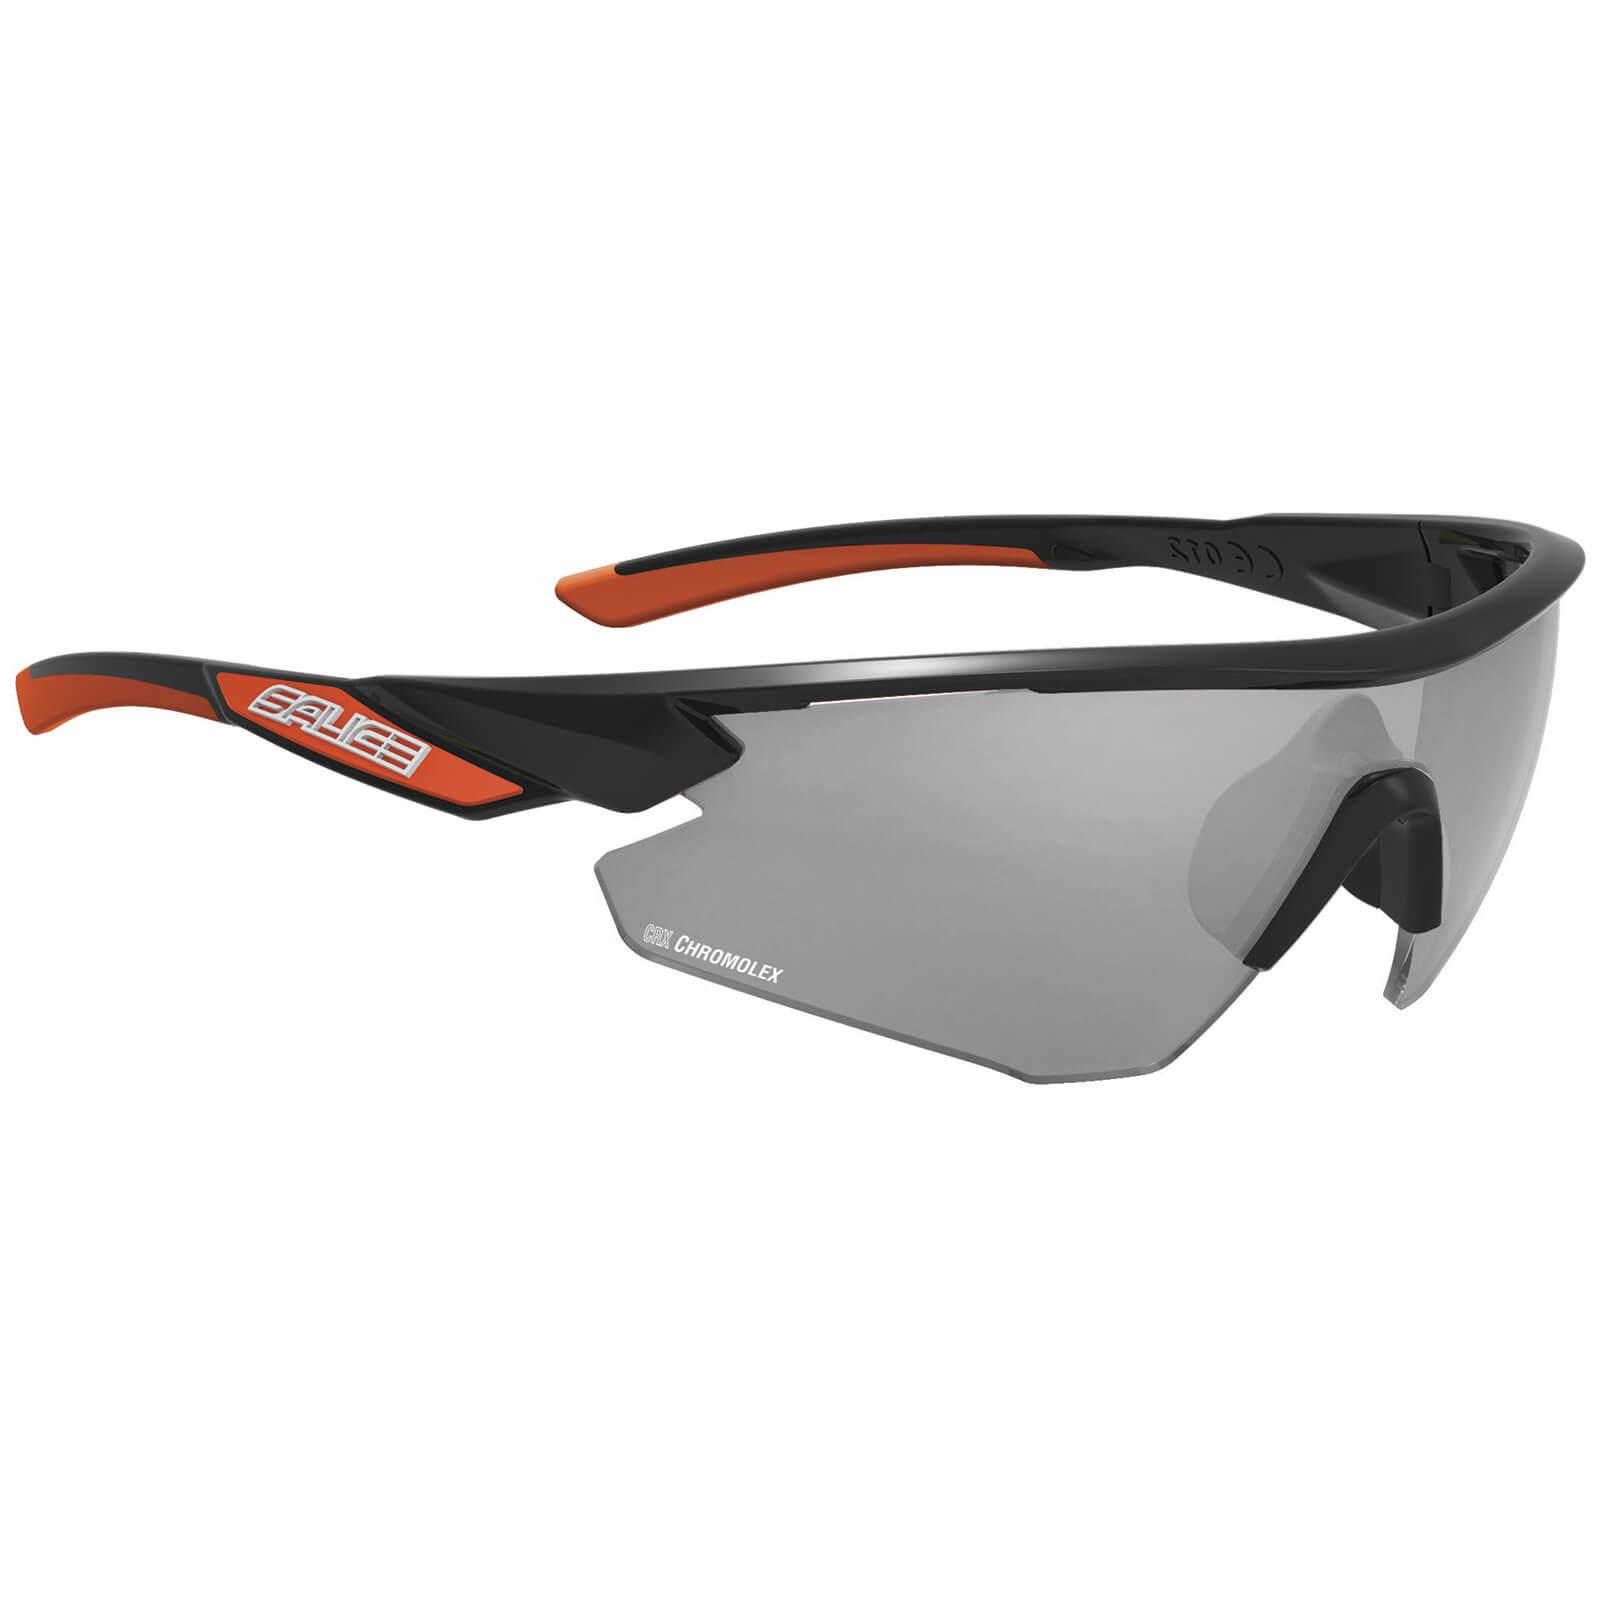 Salice 012 CRX Photochromic Sunglasses - Black/Grey